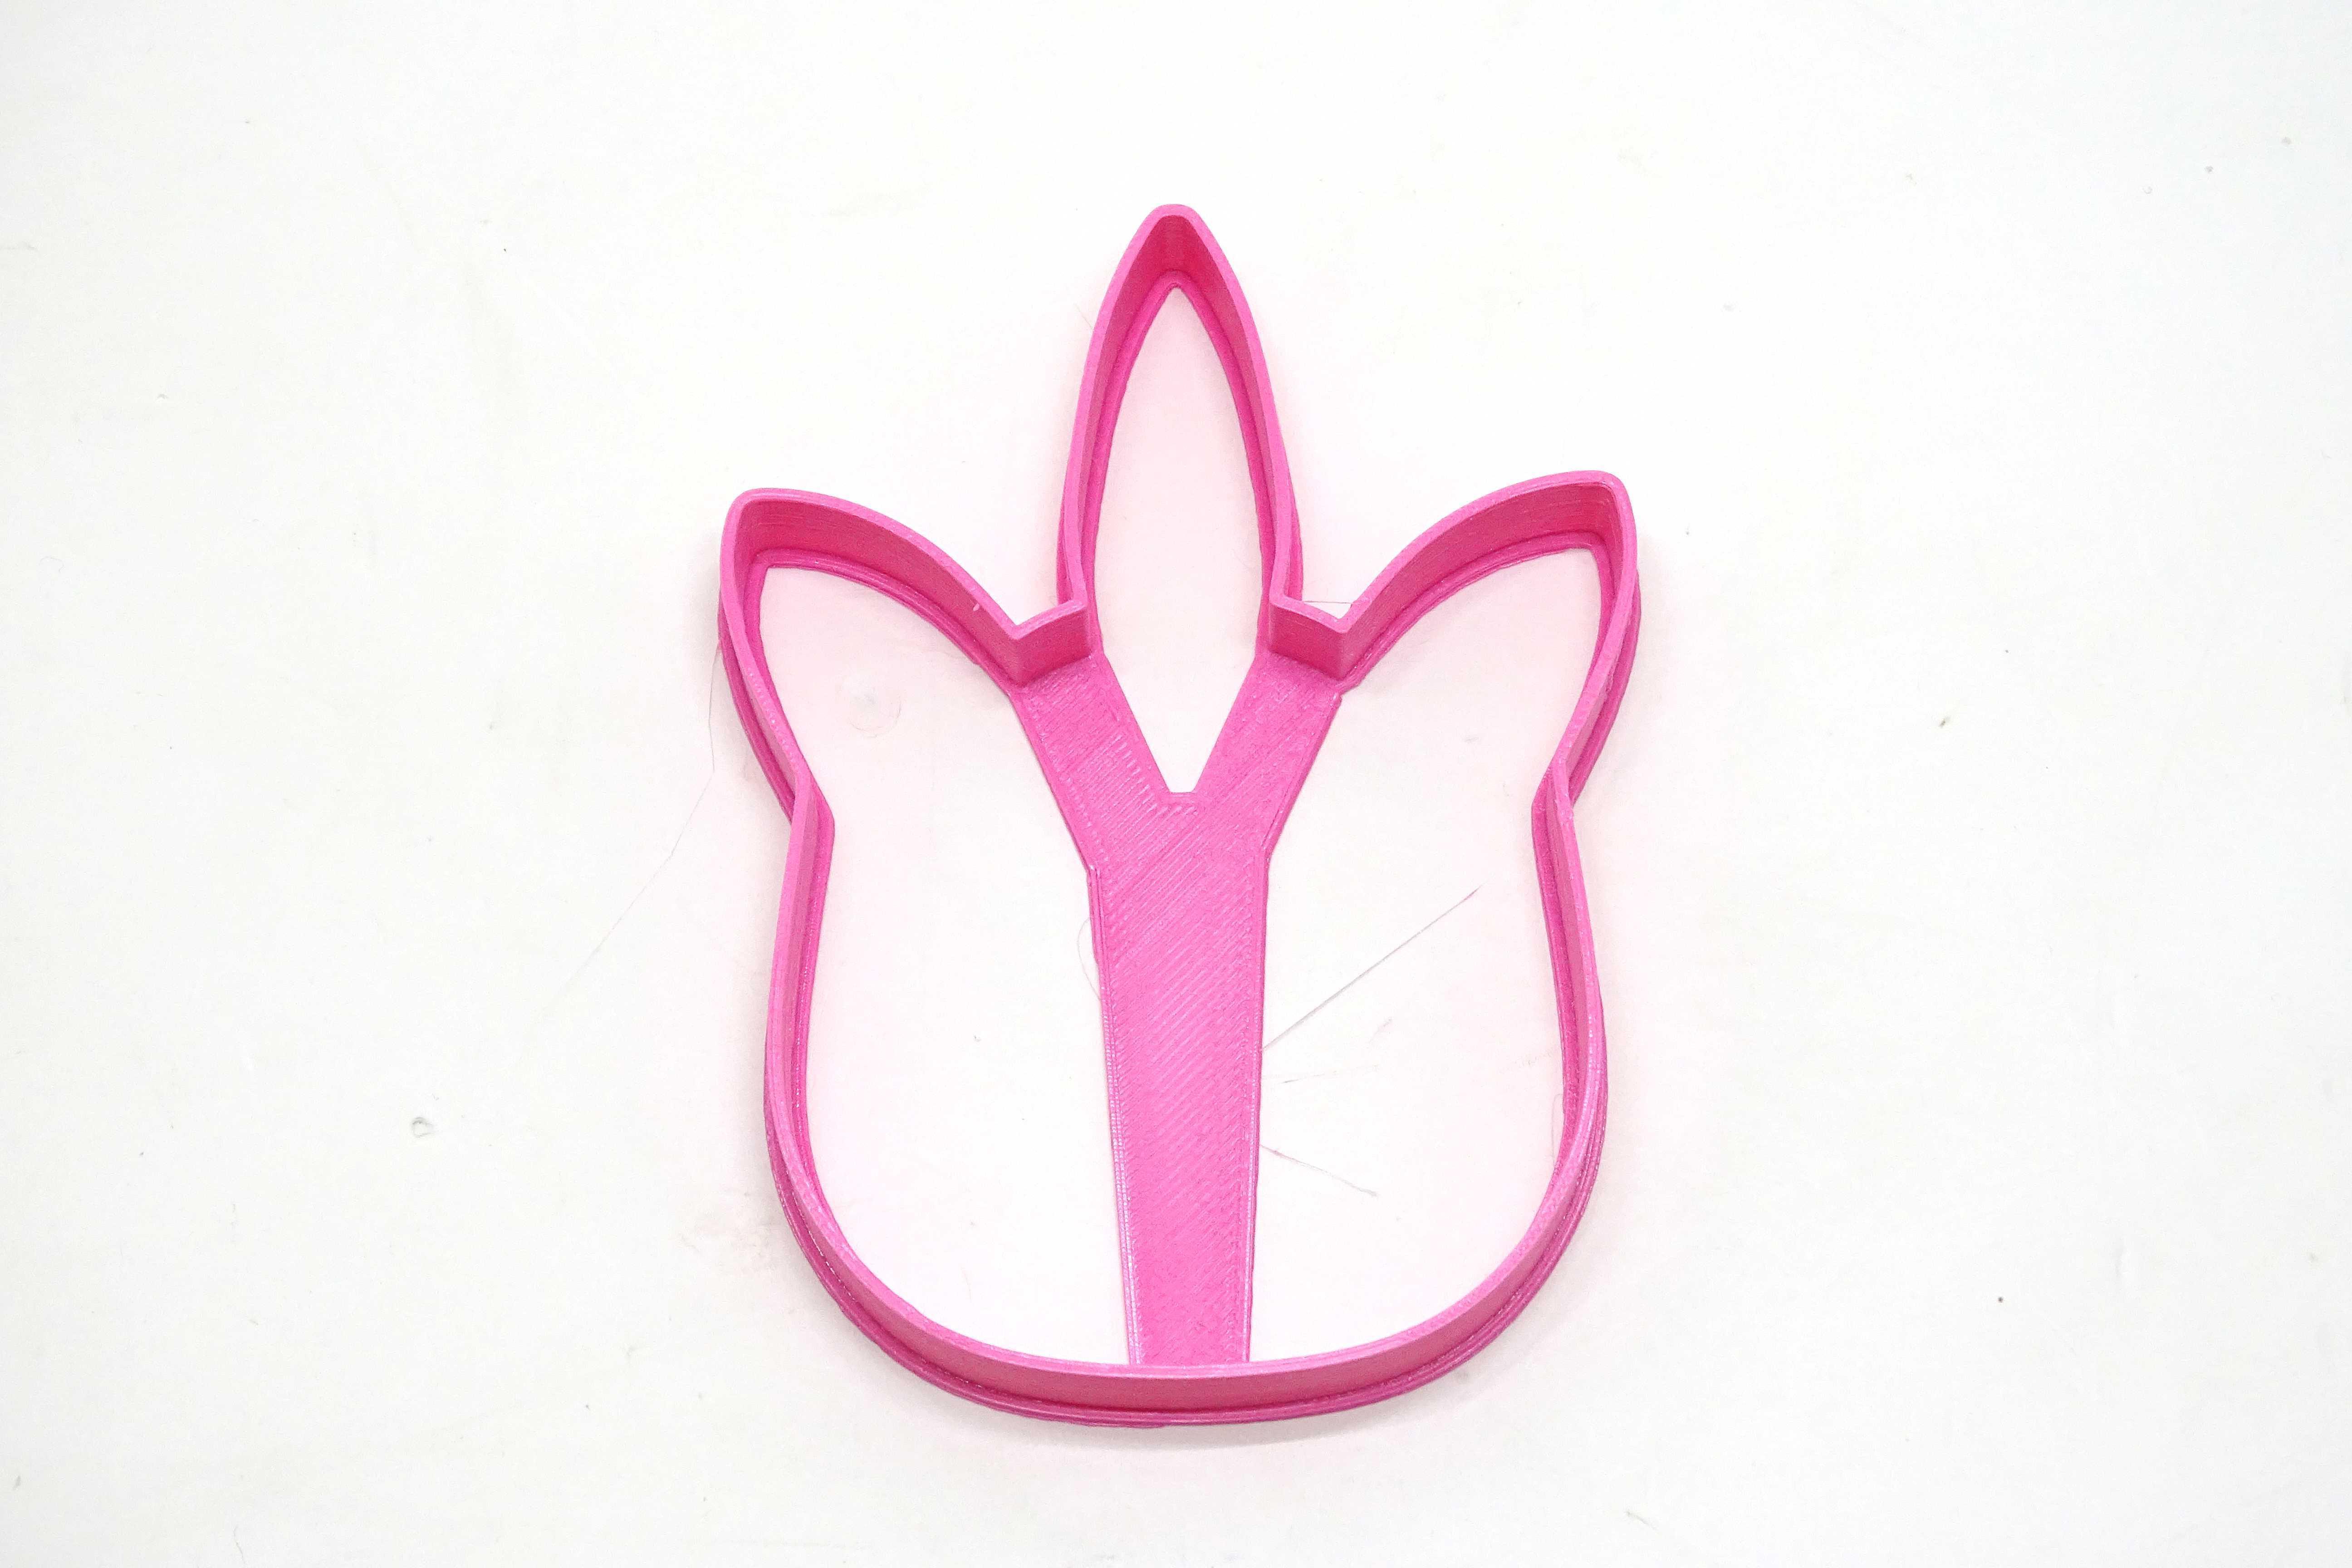 unicornio cara.JPG Download STL file unicorn cookie cutter unicorns • 3D print model, PatricioVazquez